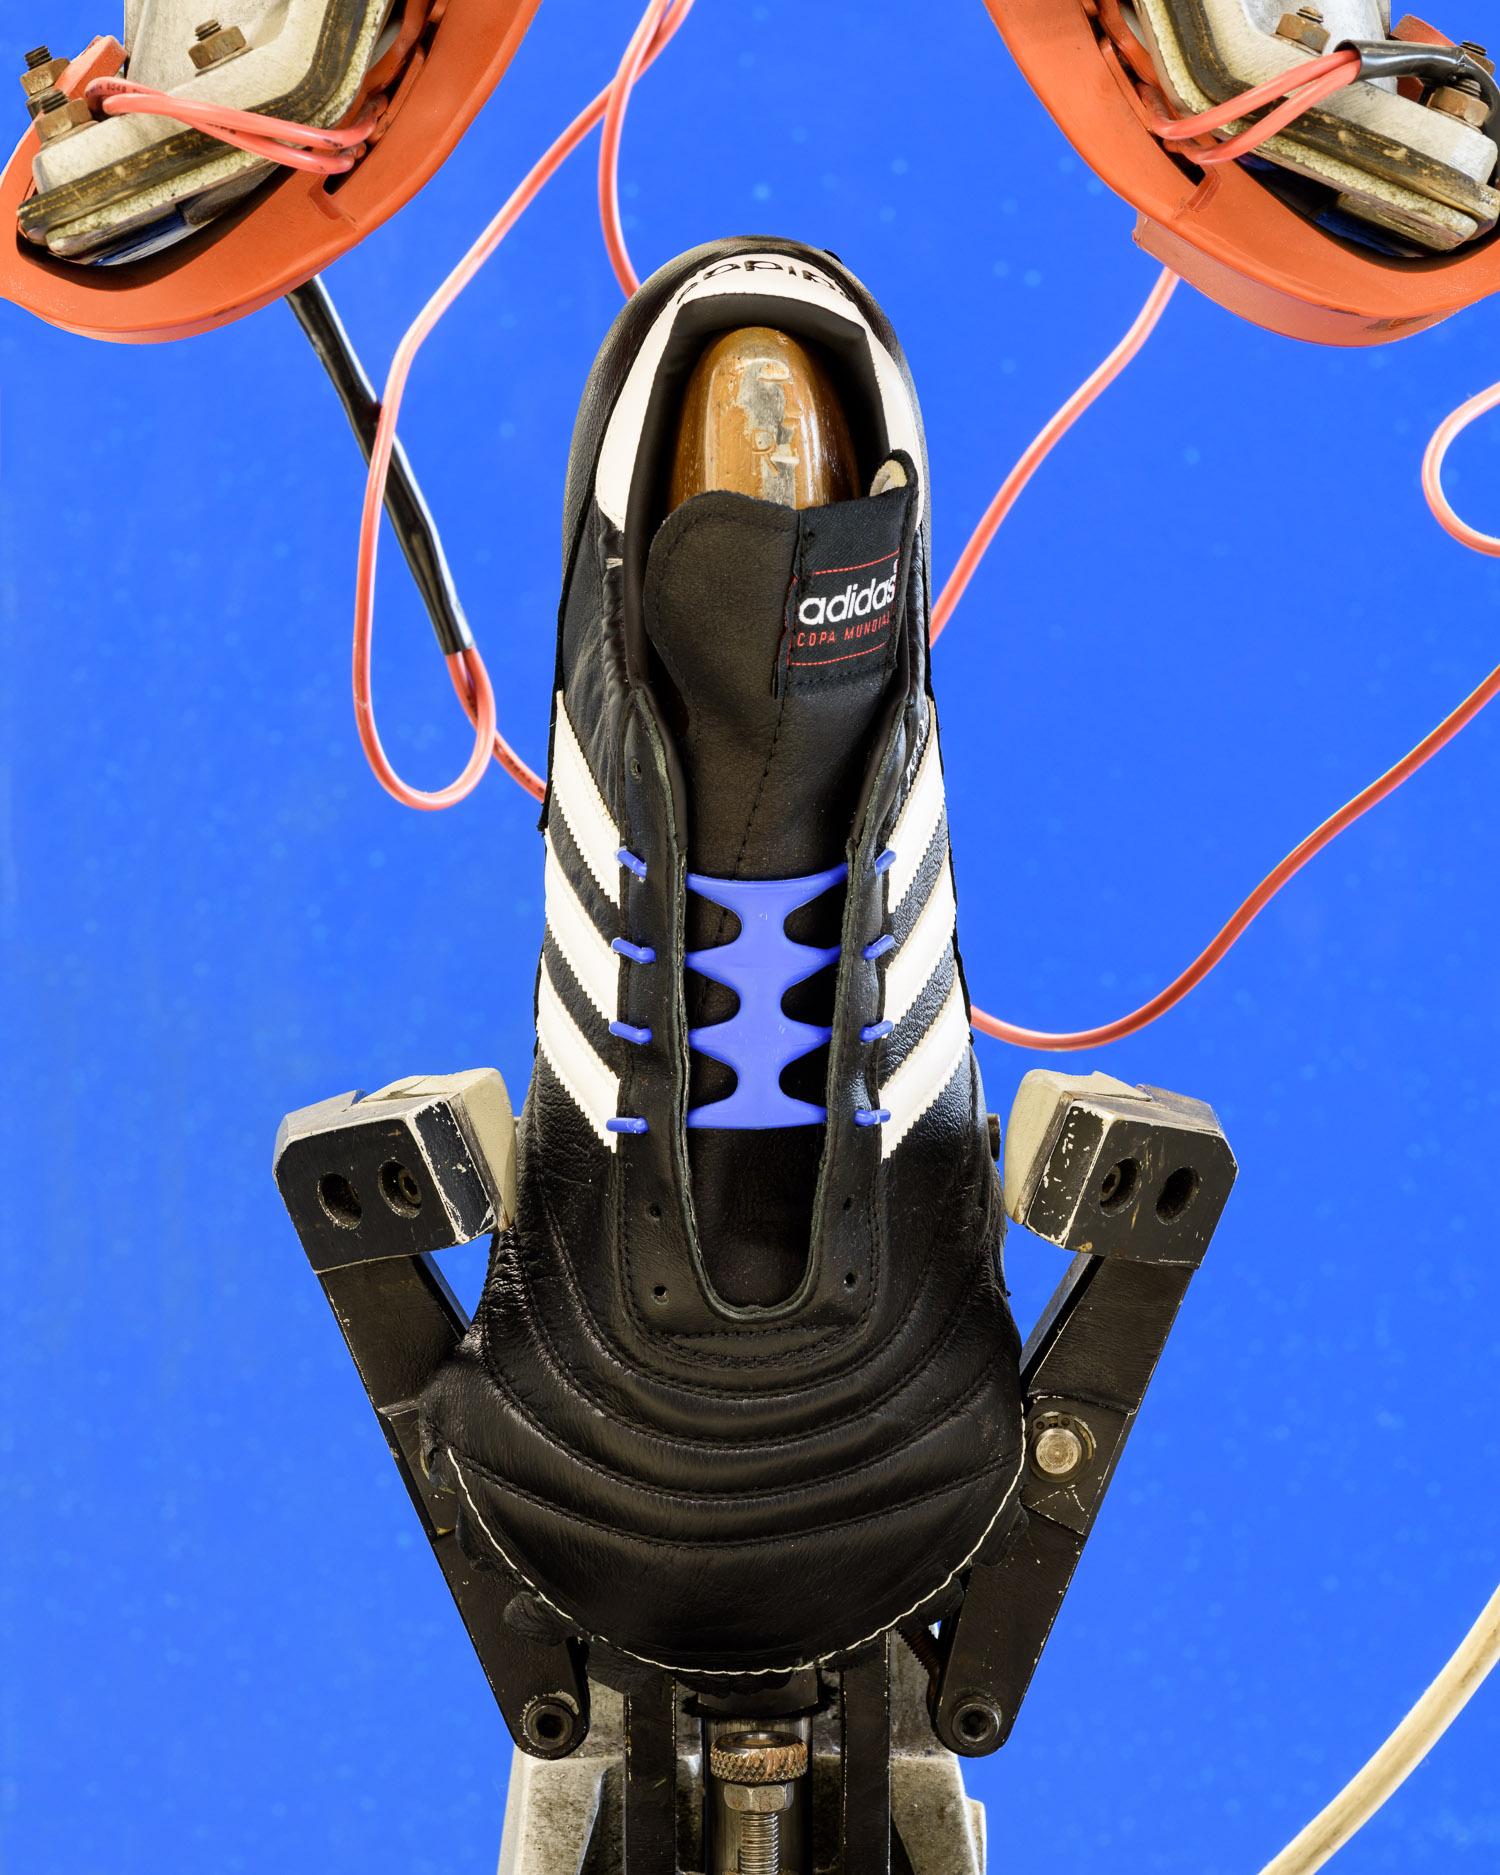 A Copa Mondial football boot on a machine in the Development Kitchen in Herzogenaurach